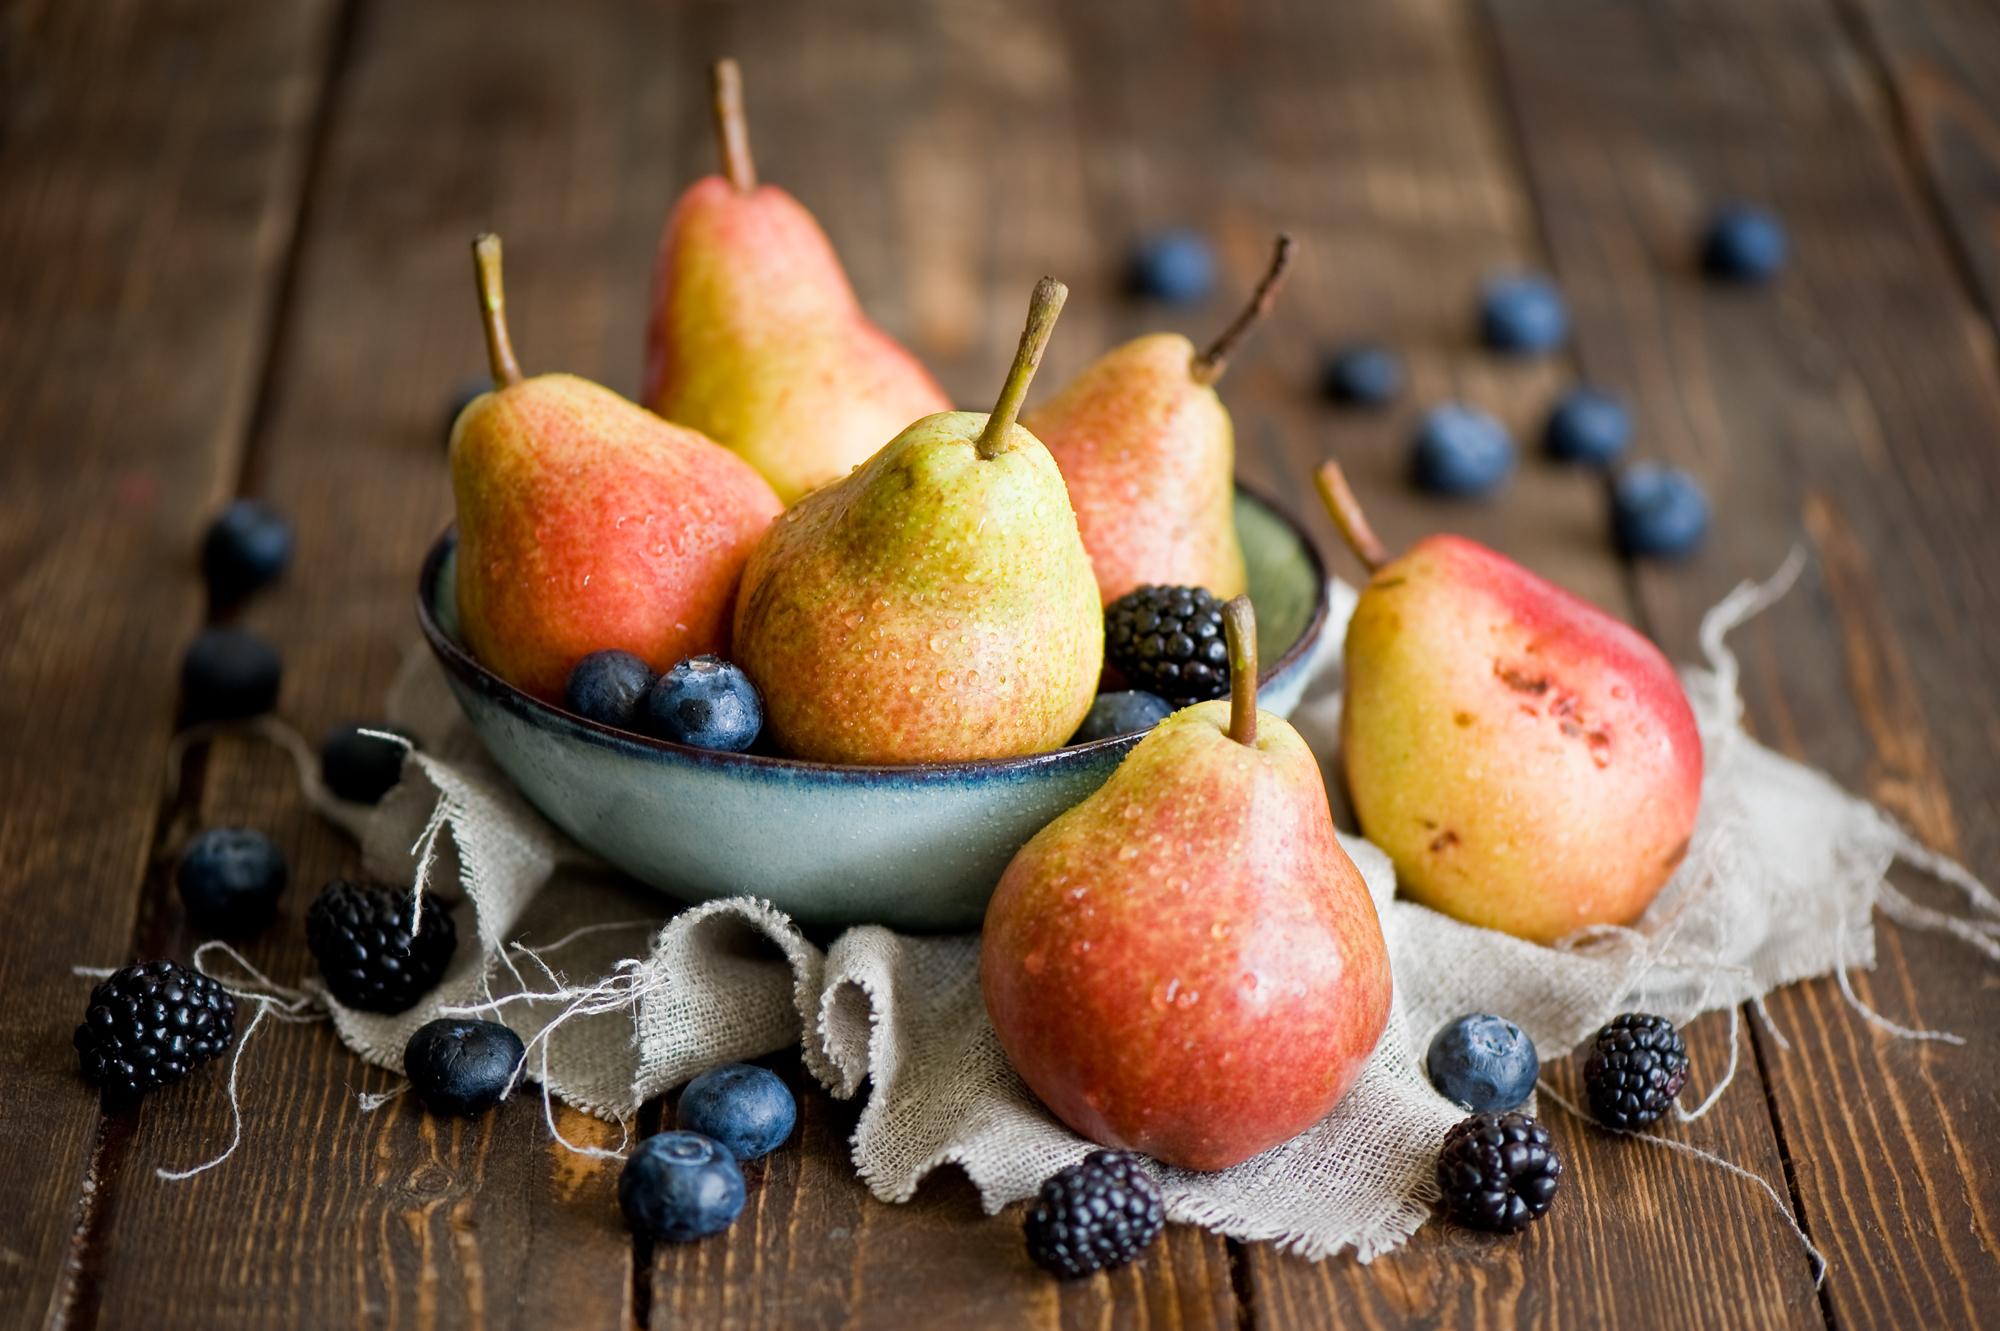 еда графика натюрморт фрукты food graphics still life fruit без смс